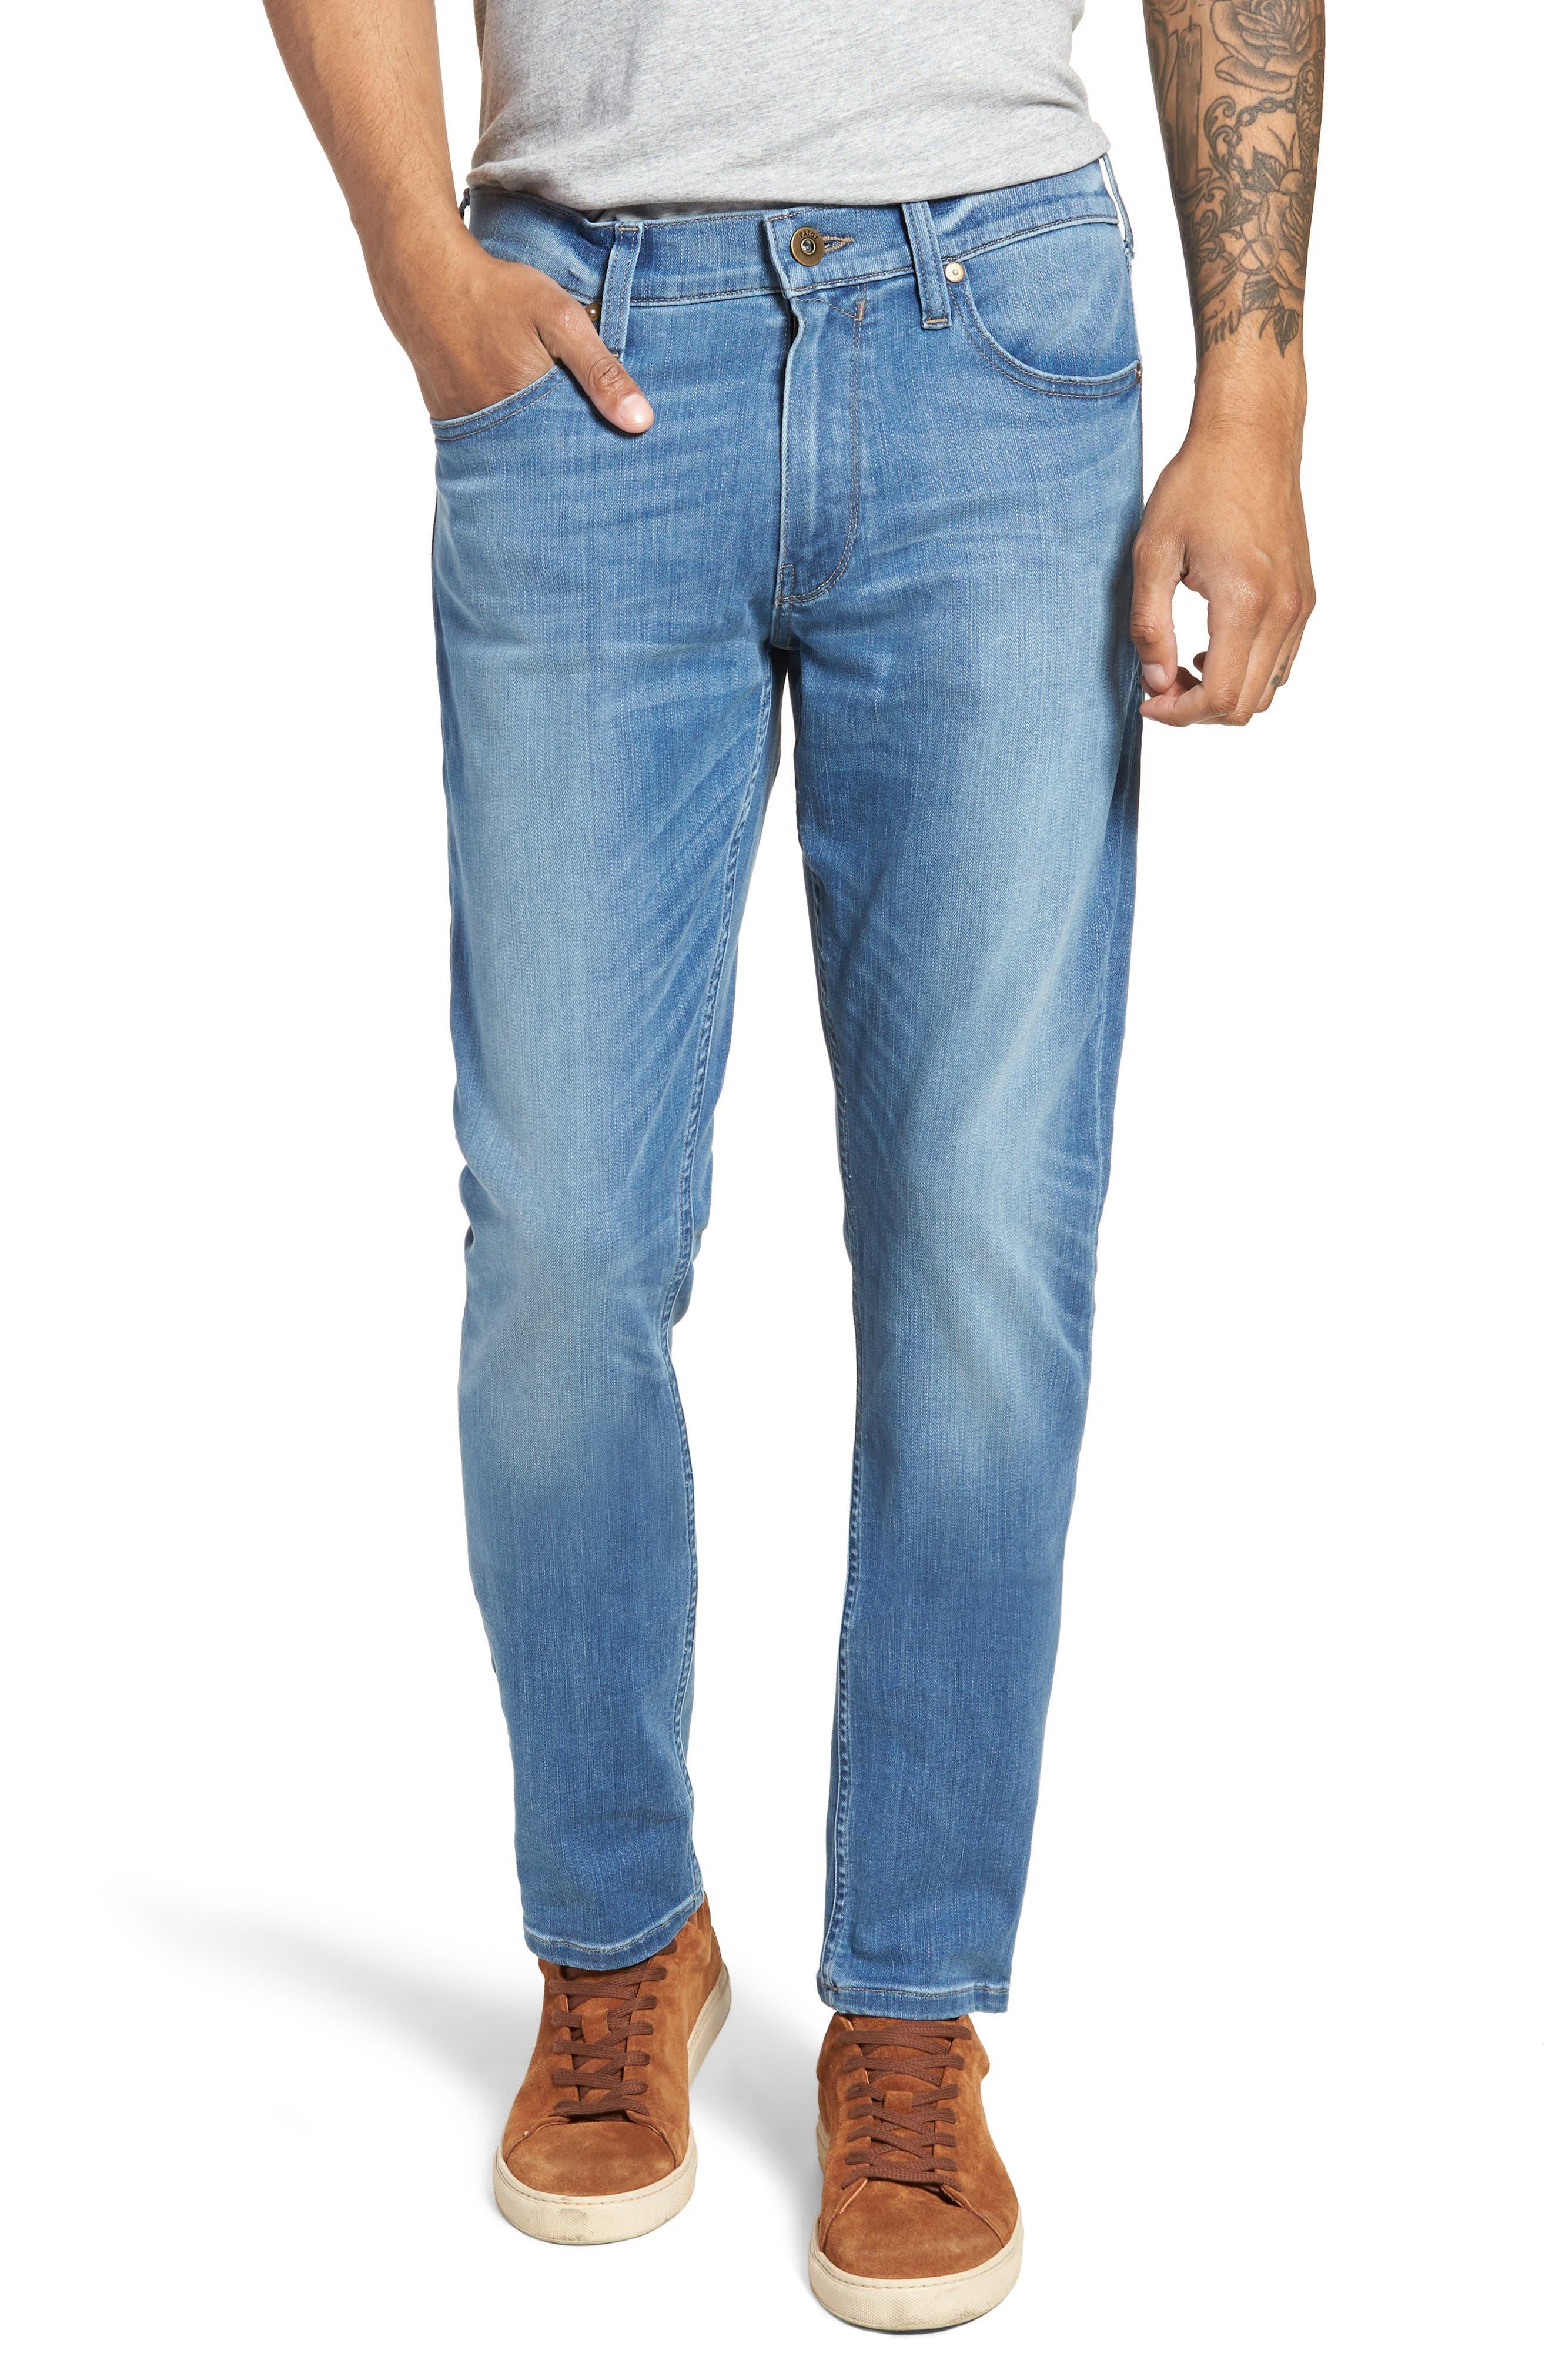 Transcend - Federal Slim Straight Leg Jeans,                         Main,                         color, Hammonds